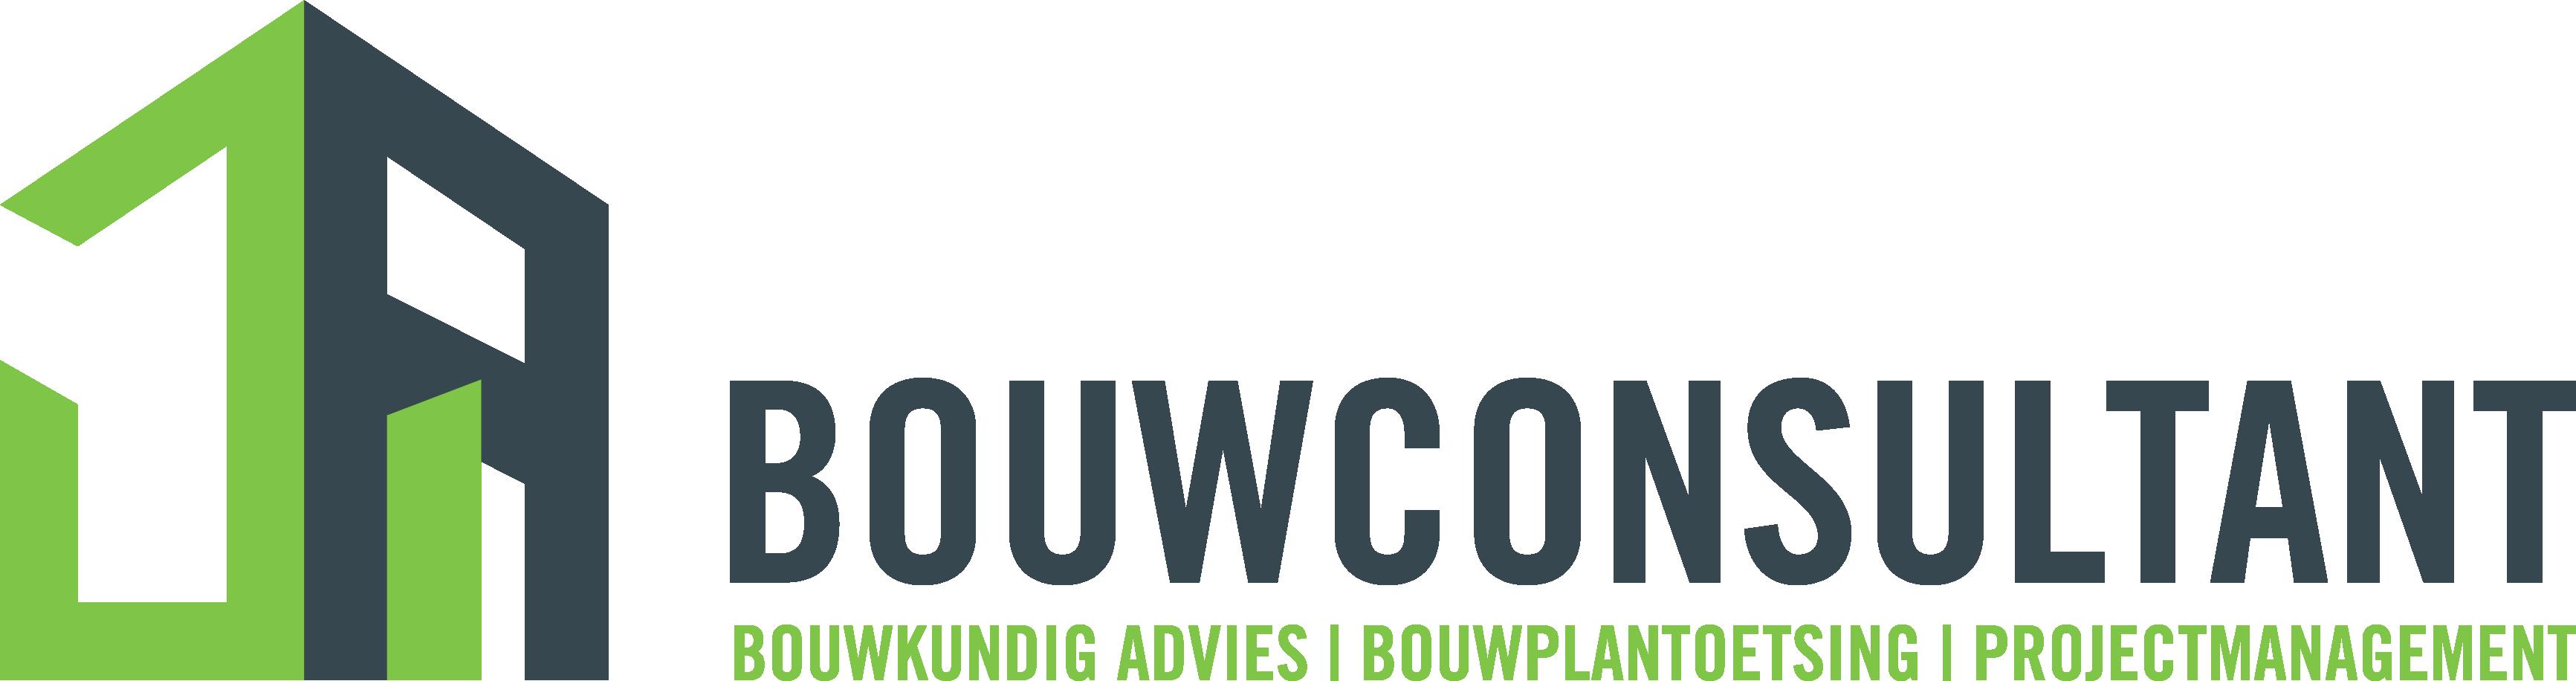 JA Bouwconsultant